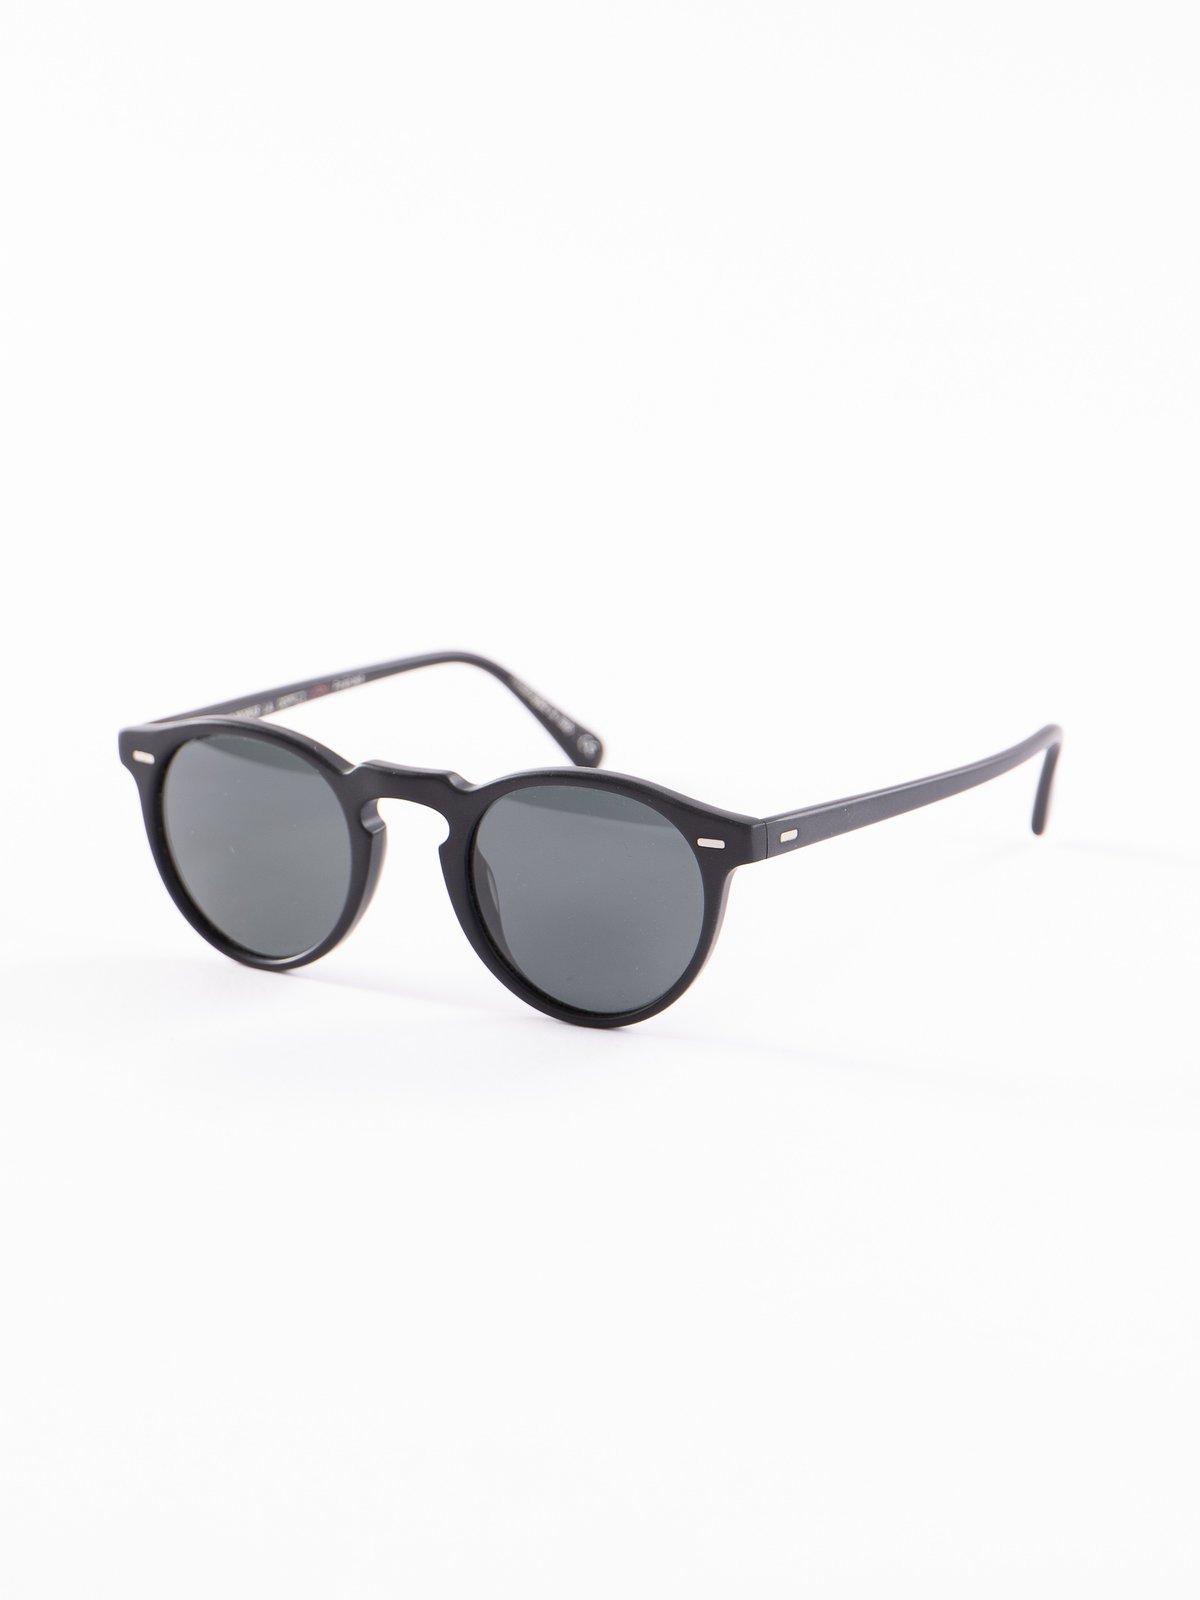 Semi–Matte Black/Dark Grey Polar Gregory Peck Sunglasses - Image 2